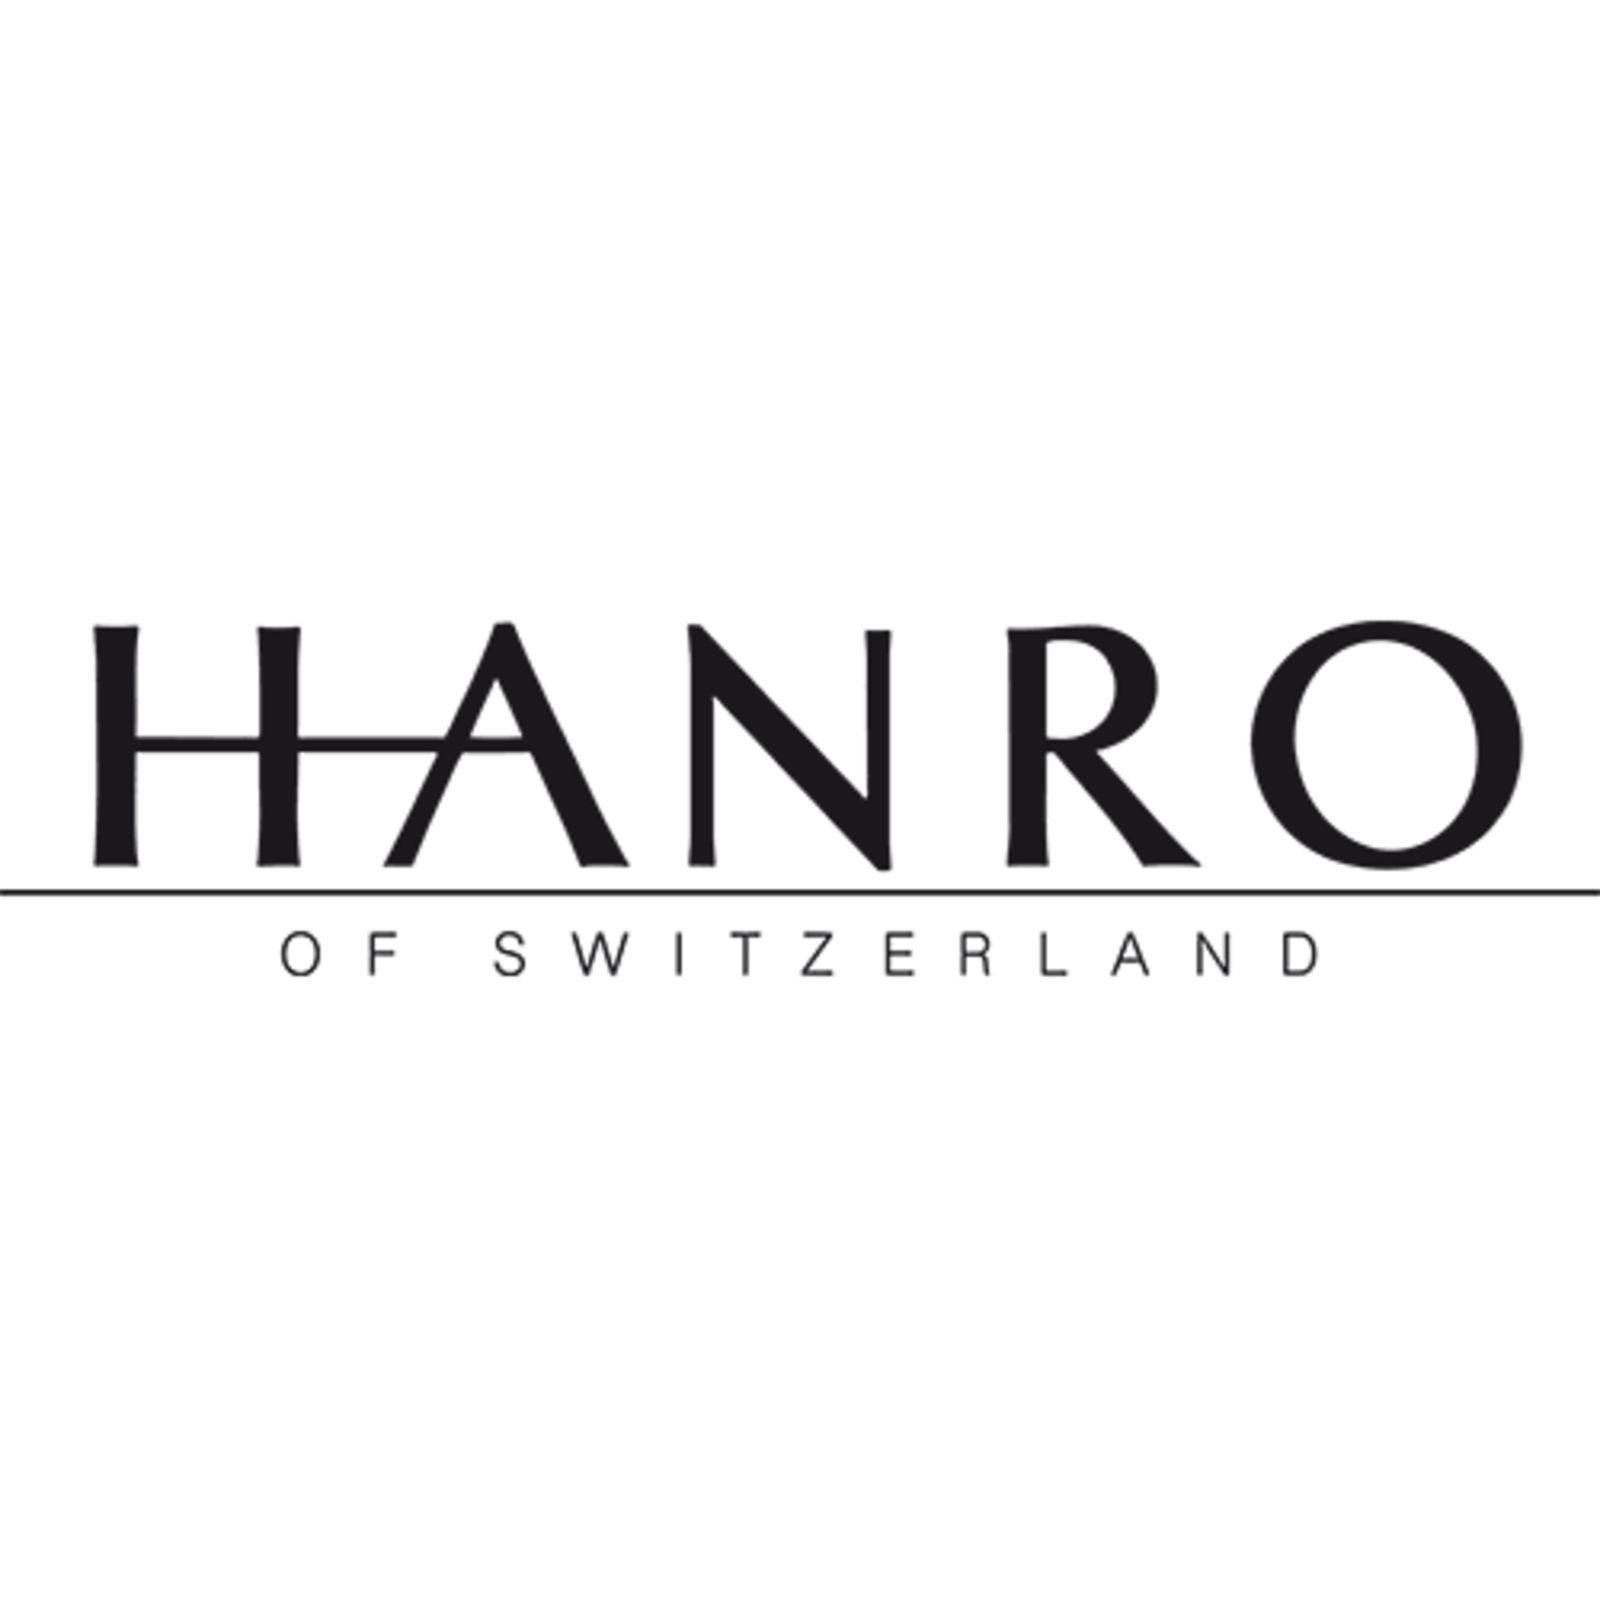 HANRO (Bild 1)